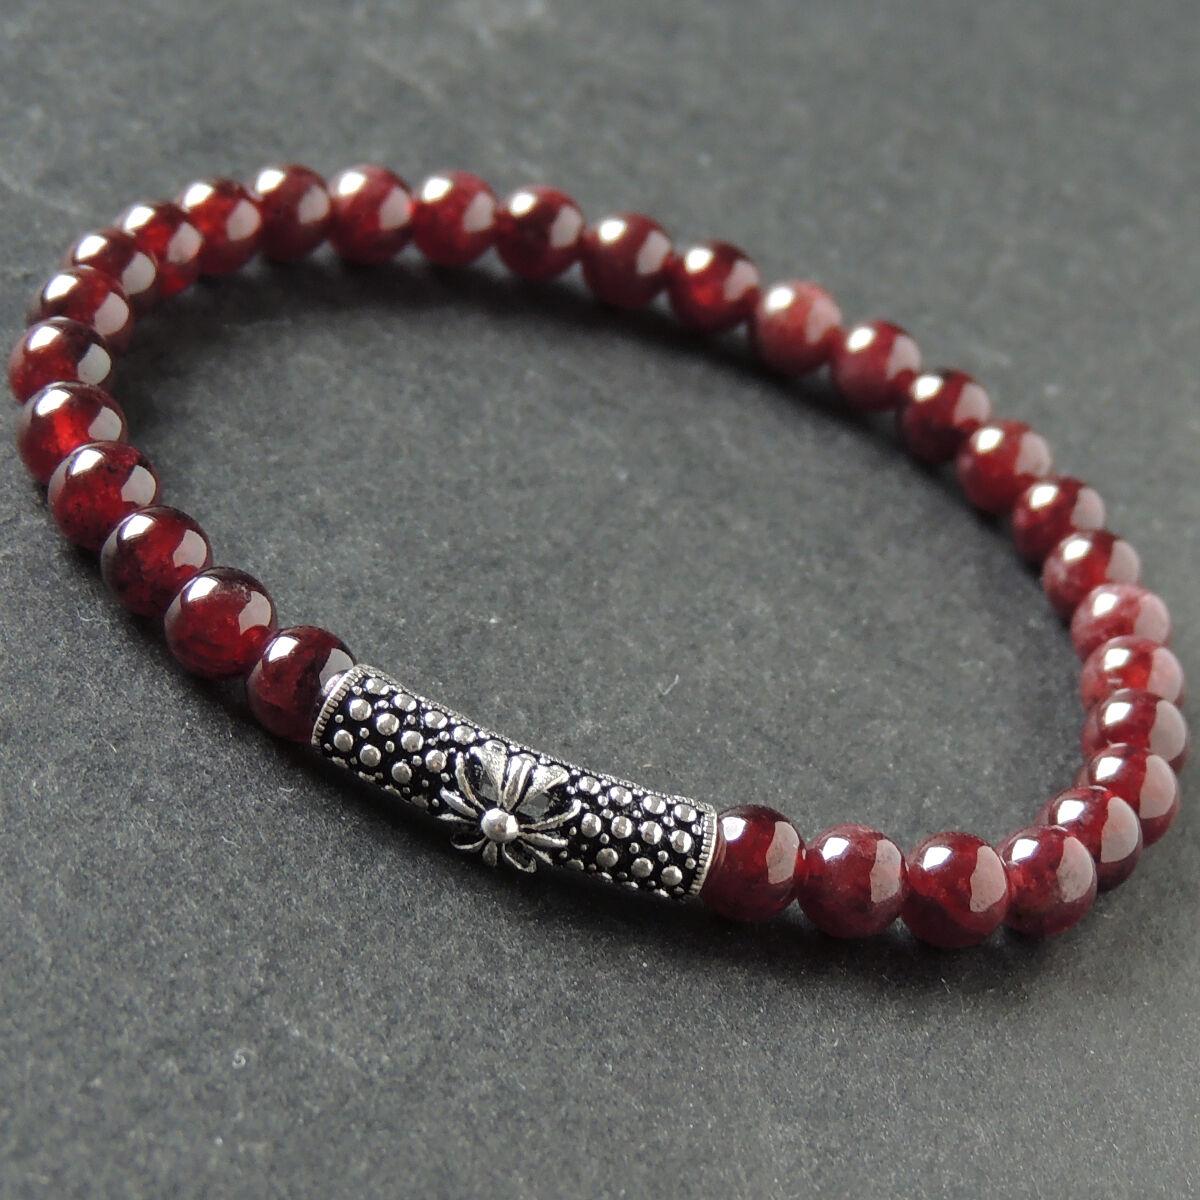 Sacred Cross Charm Bracelet Natural Garnet 925 Sterling Silver for Men and Women